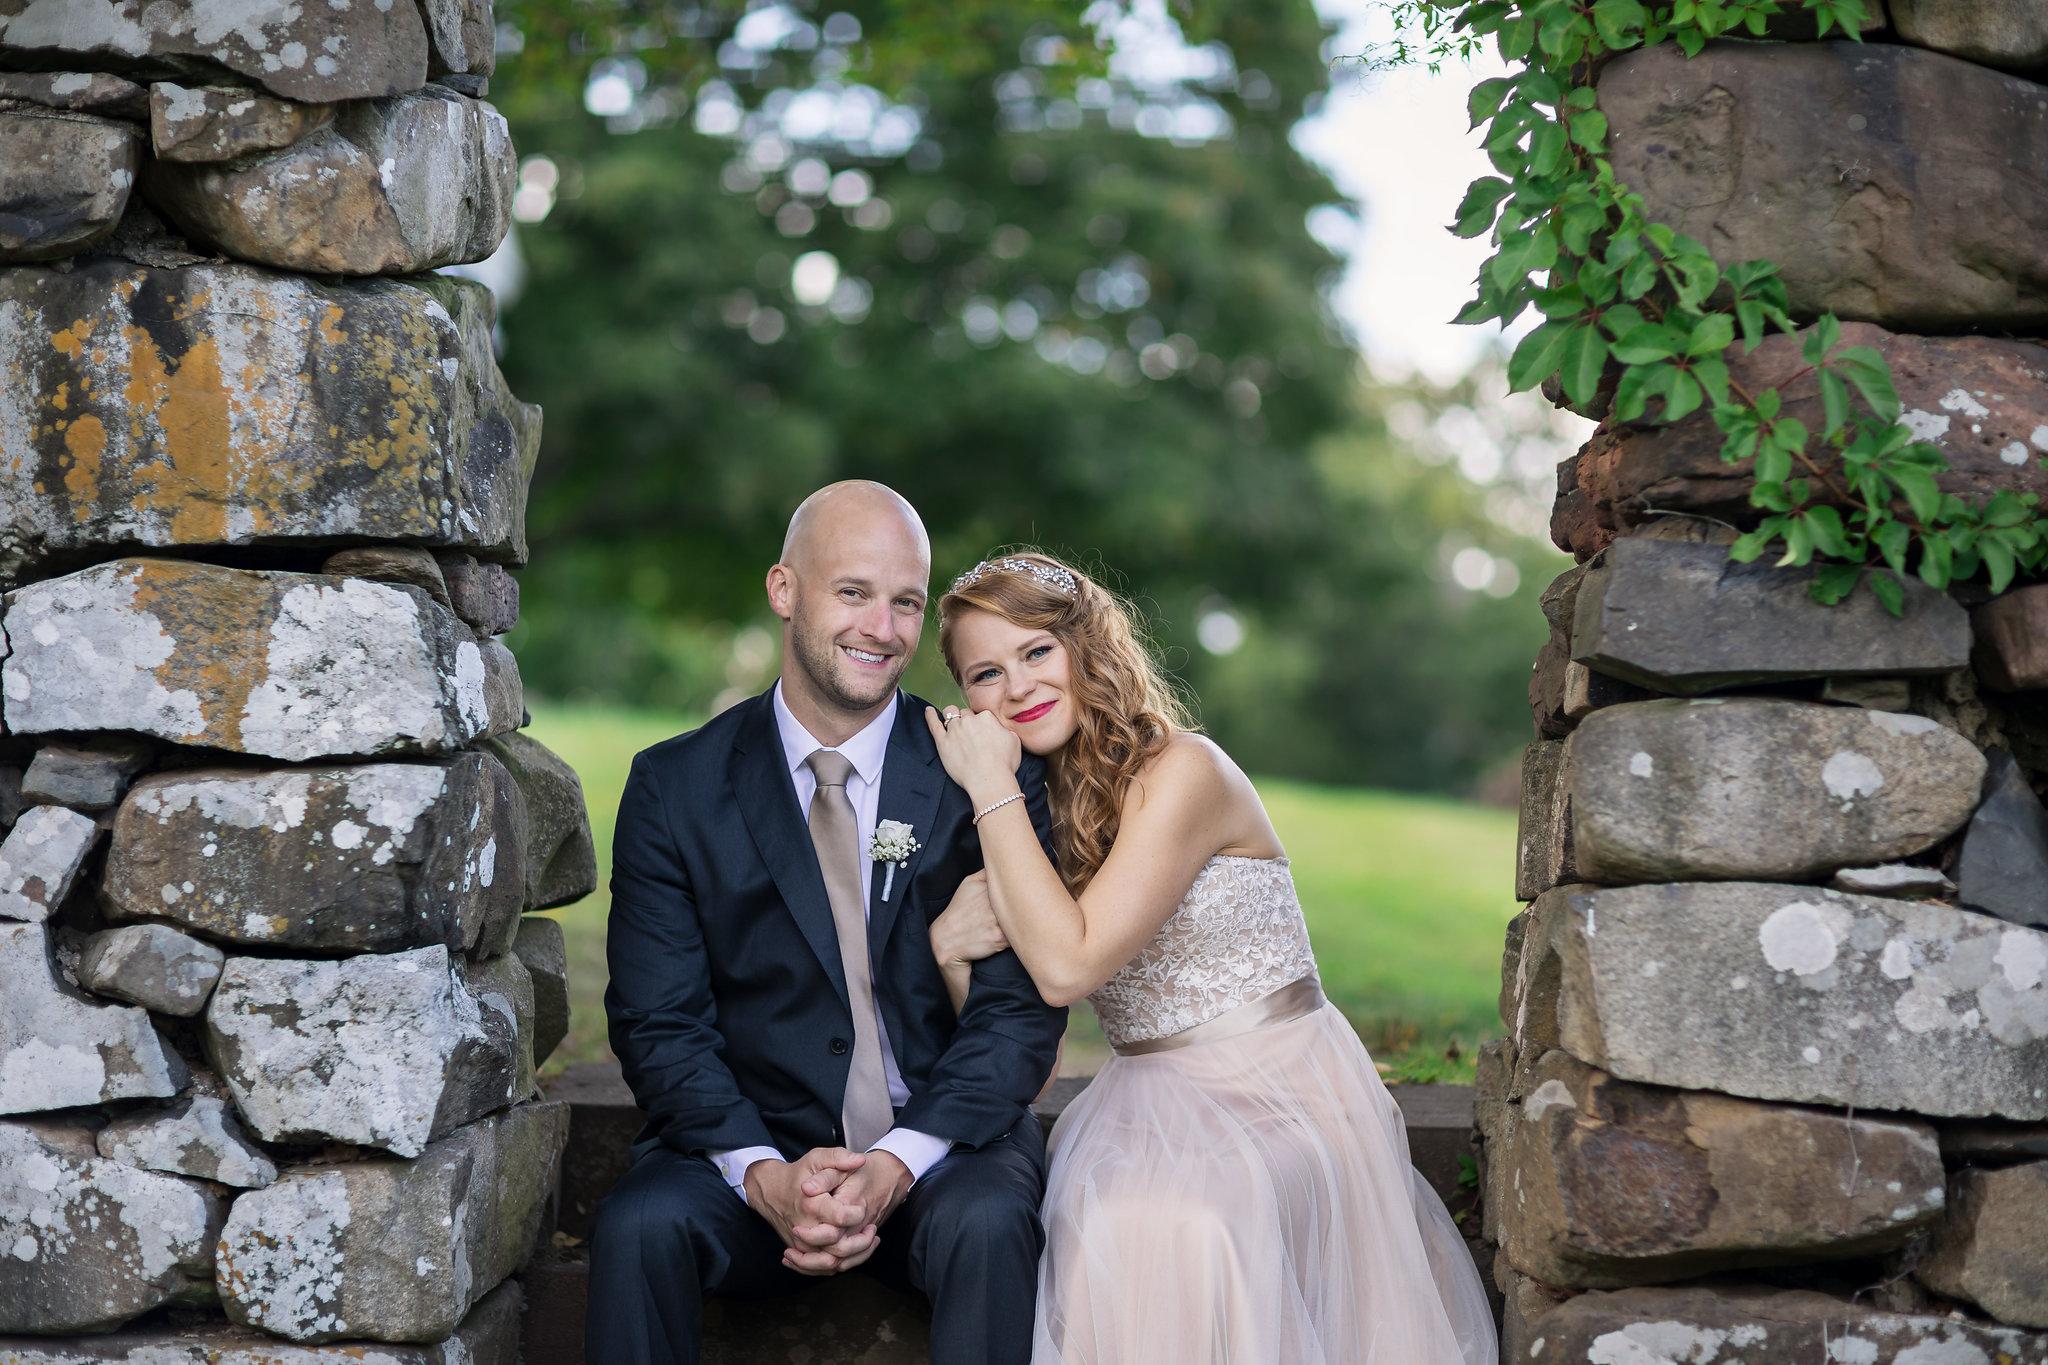 katie-brian-wedding-portraits-251 - Copy.jpg